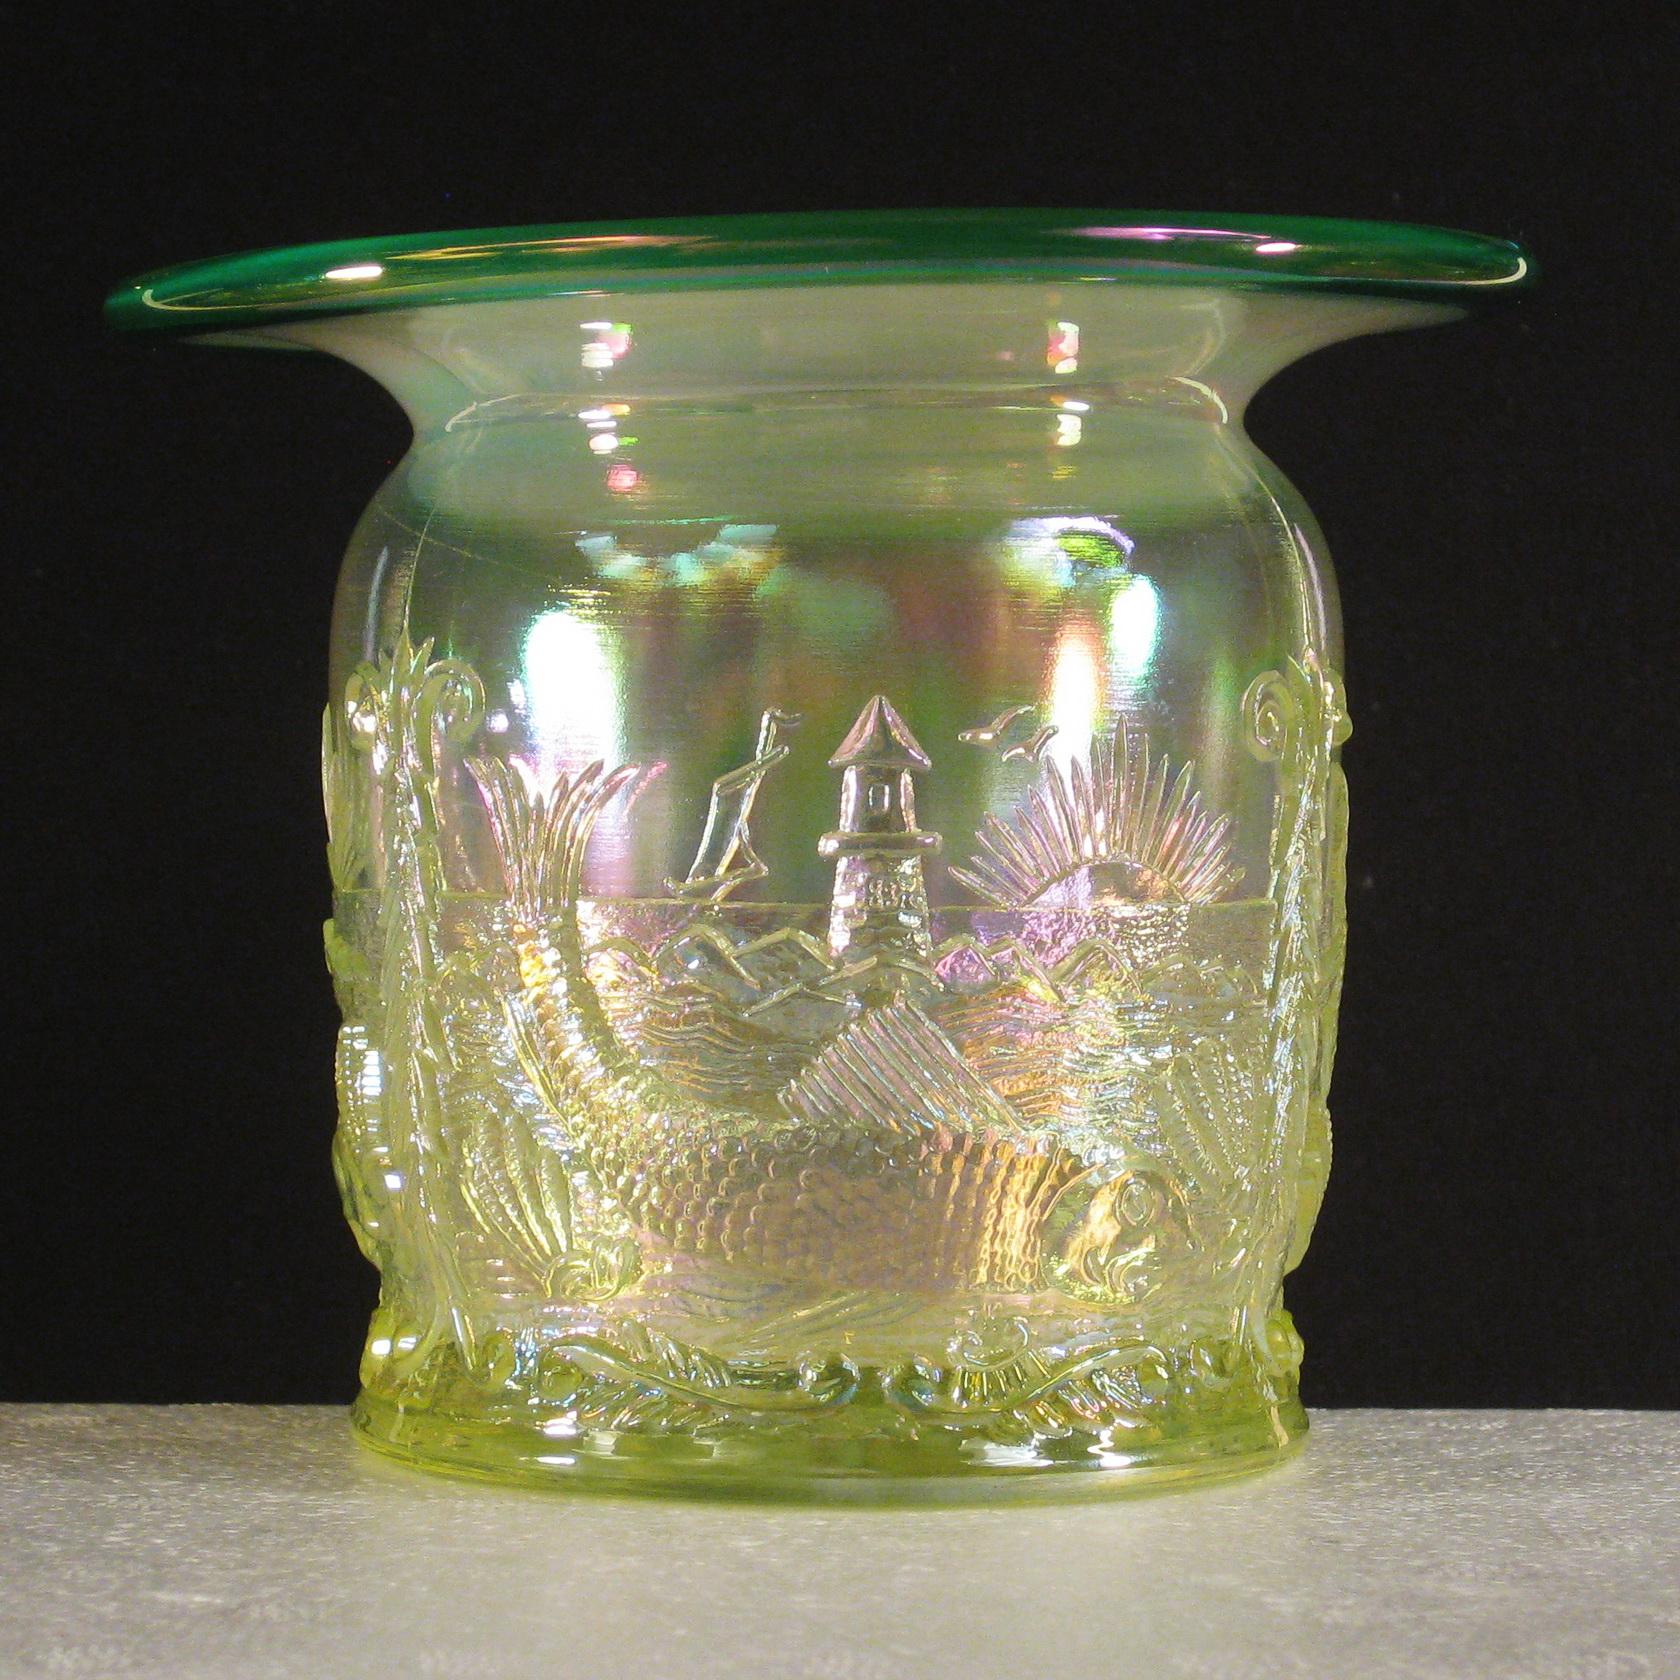 Fenton vaseline opal wgreen crest seacoast carnival glass fenton vaseline opal wgreen crest seacoast carnival glass spittoon reviewsmspy